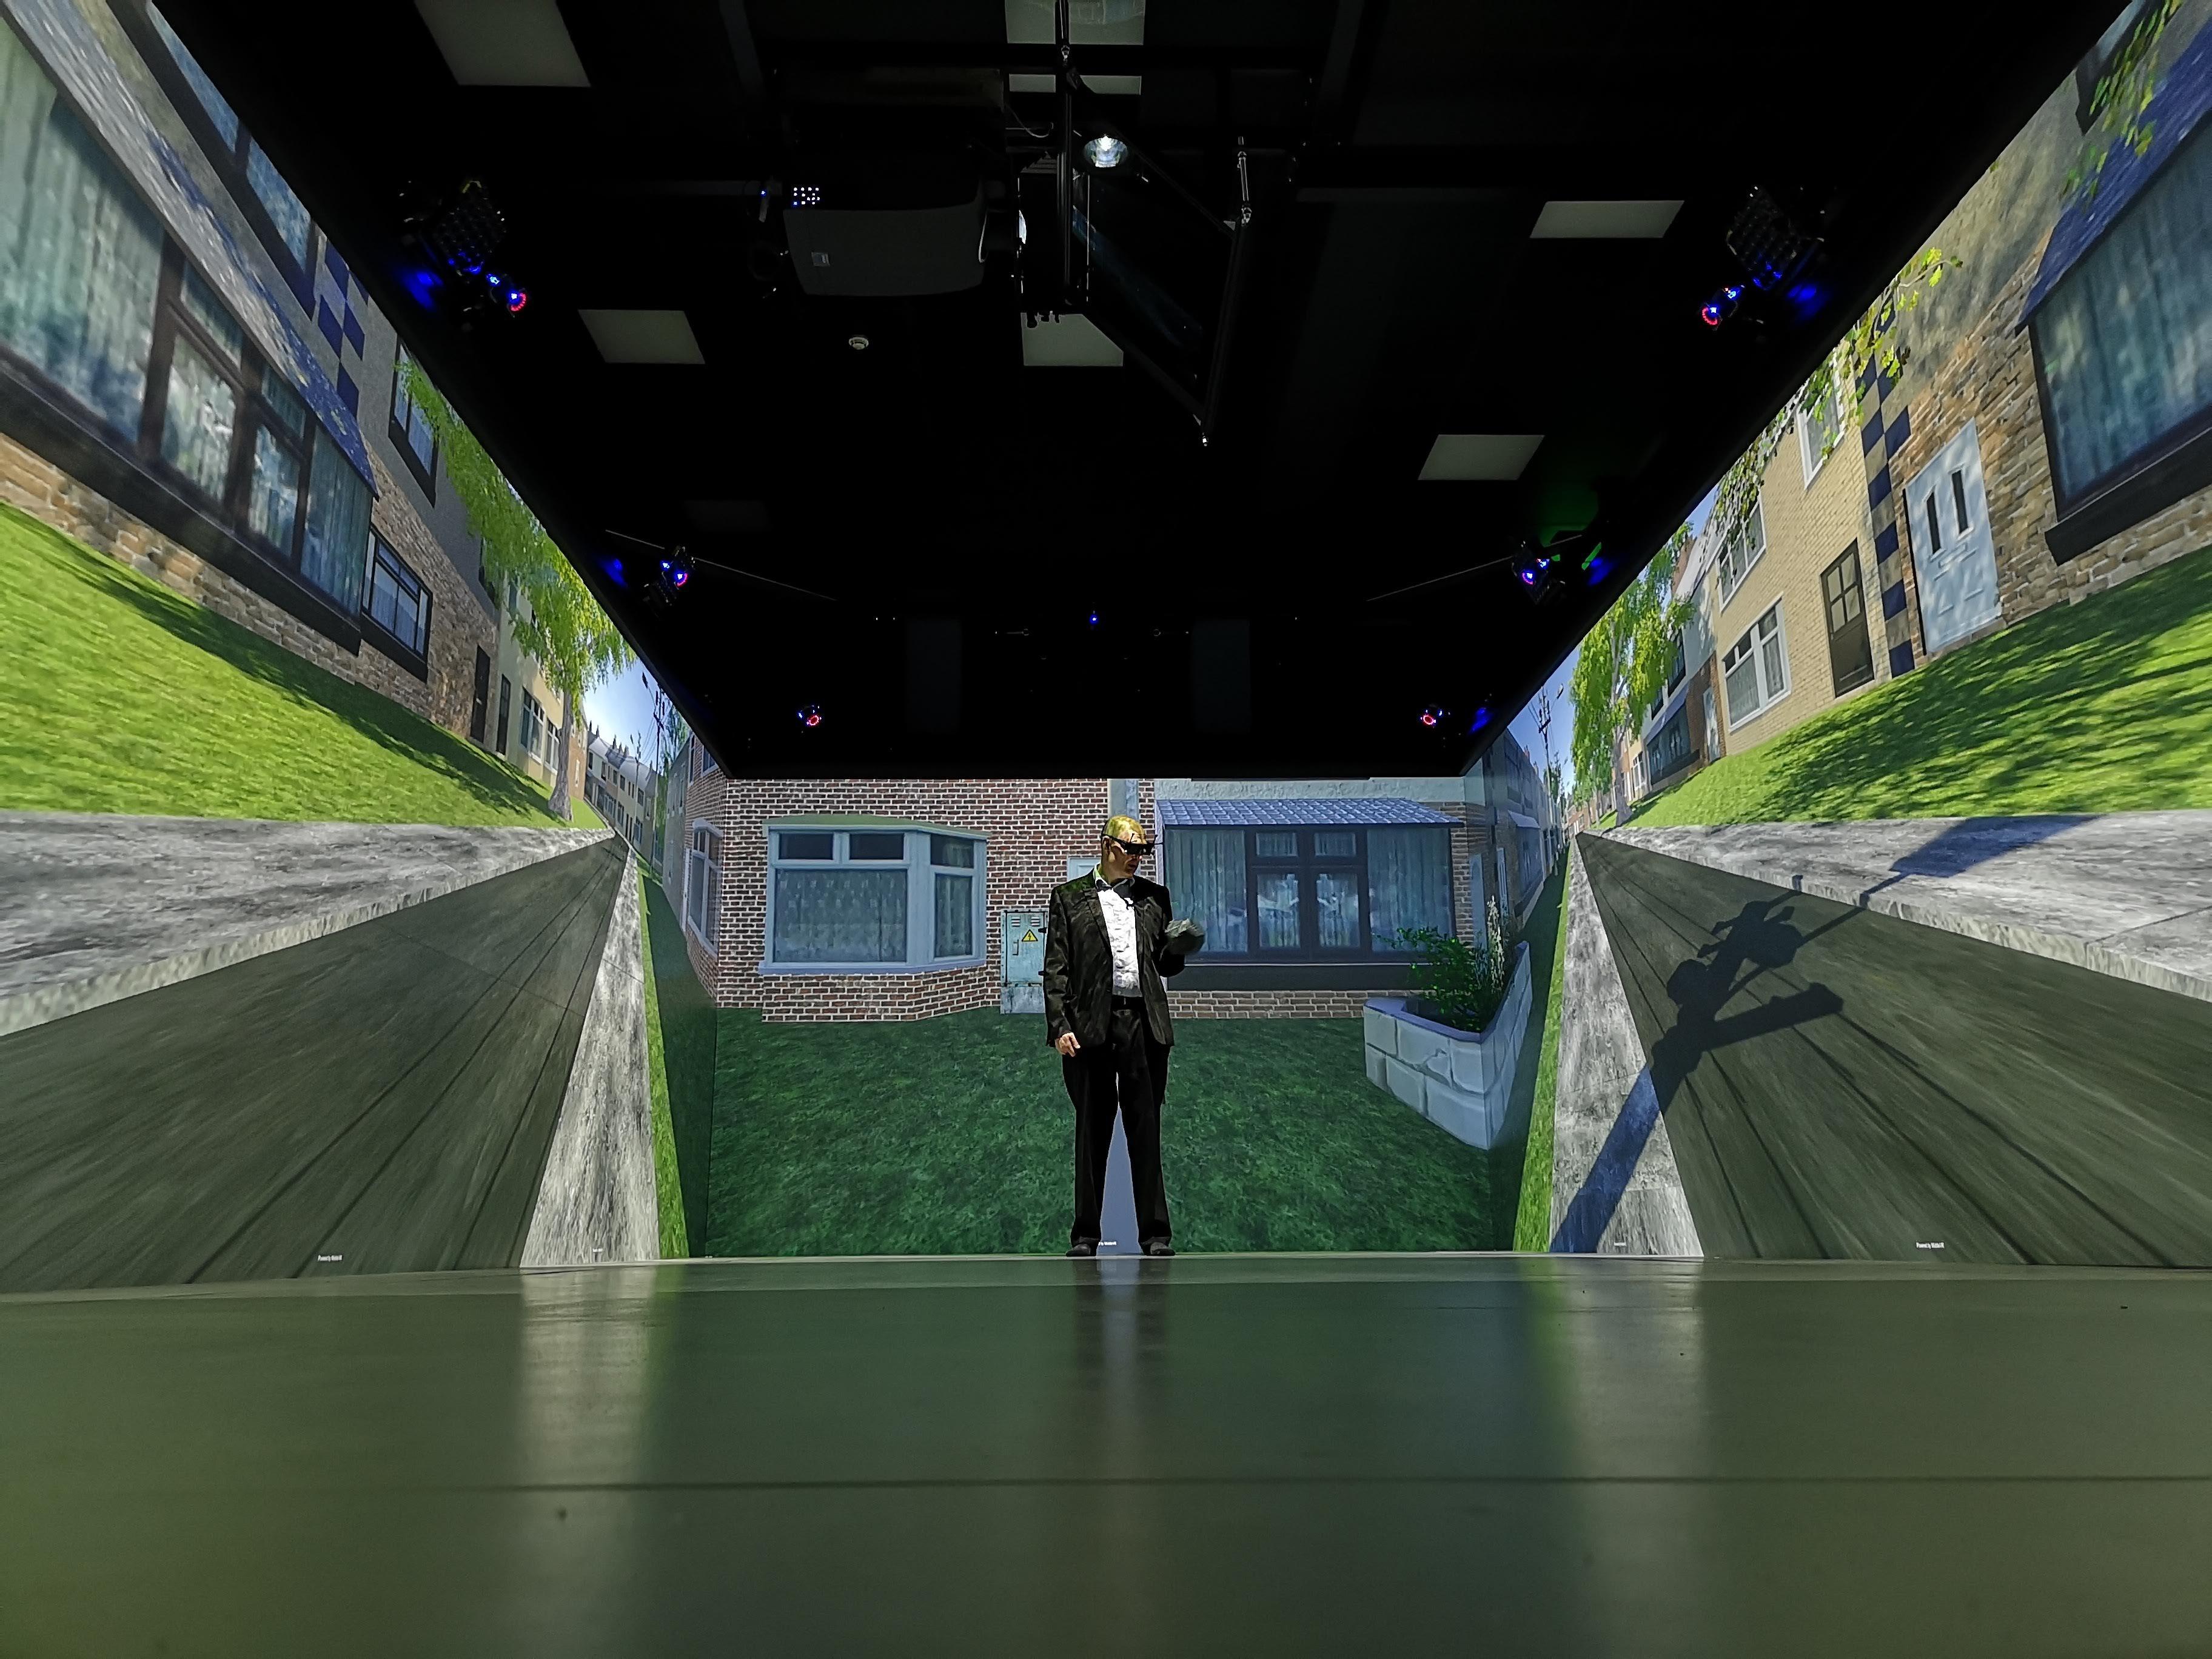 Pedestrian simulator - Leeds Centre for Immersive Technologies